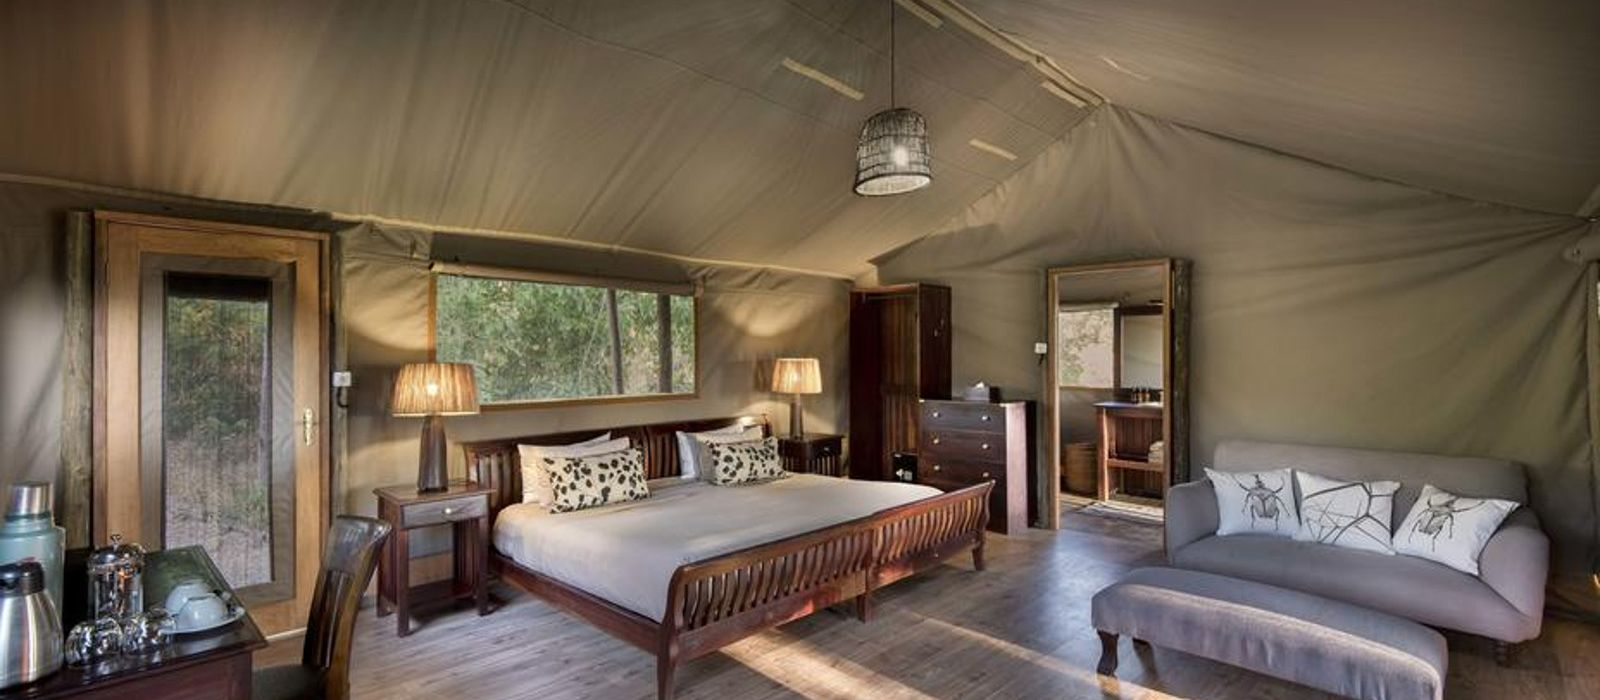 Hotel Linyanti Bush Camp Botswana